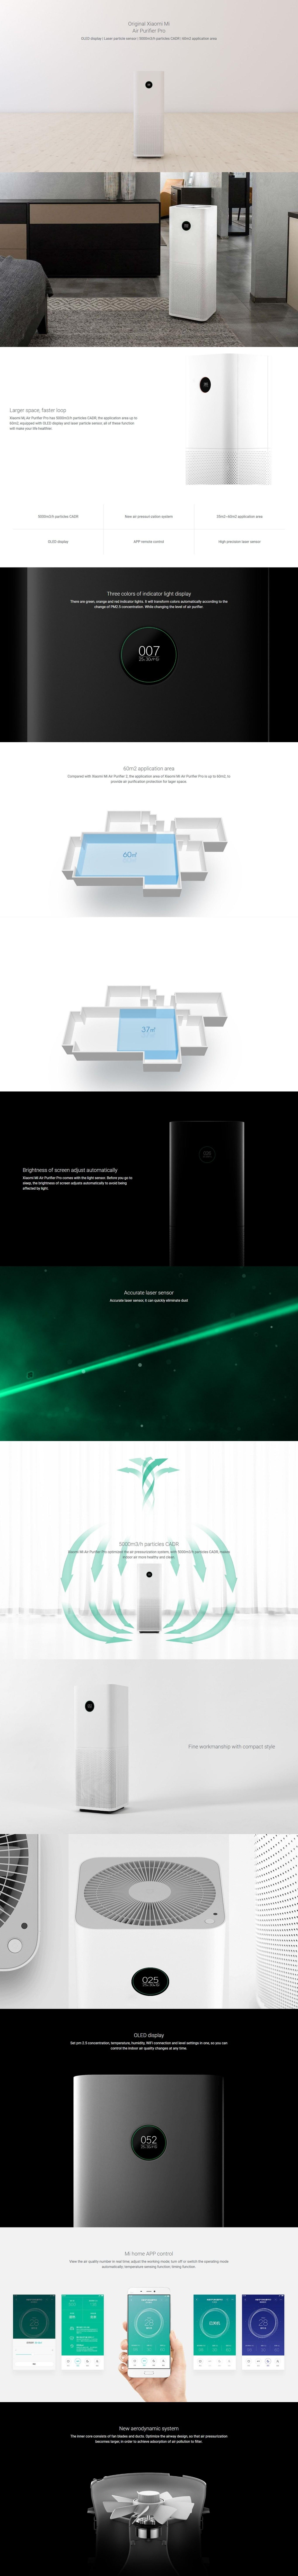 Prezentare-Xiaomi-Mi-Air-Purifier-Pro2d38ba72638c6e35.jpg